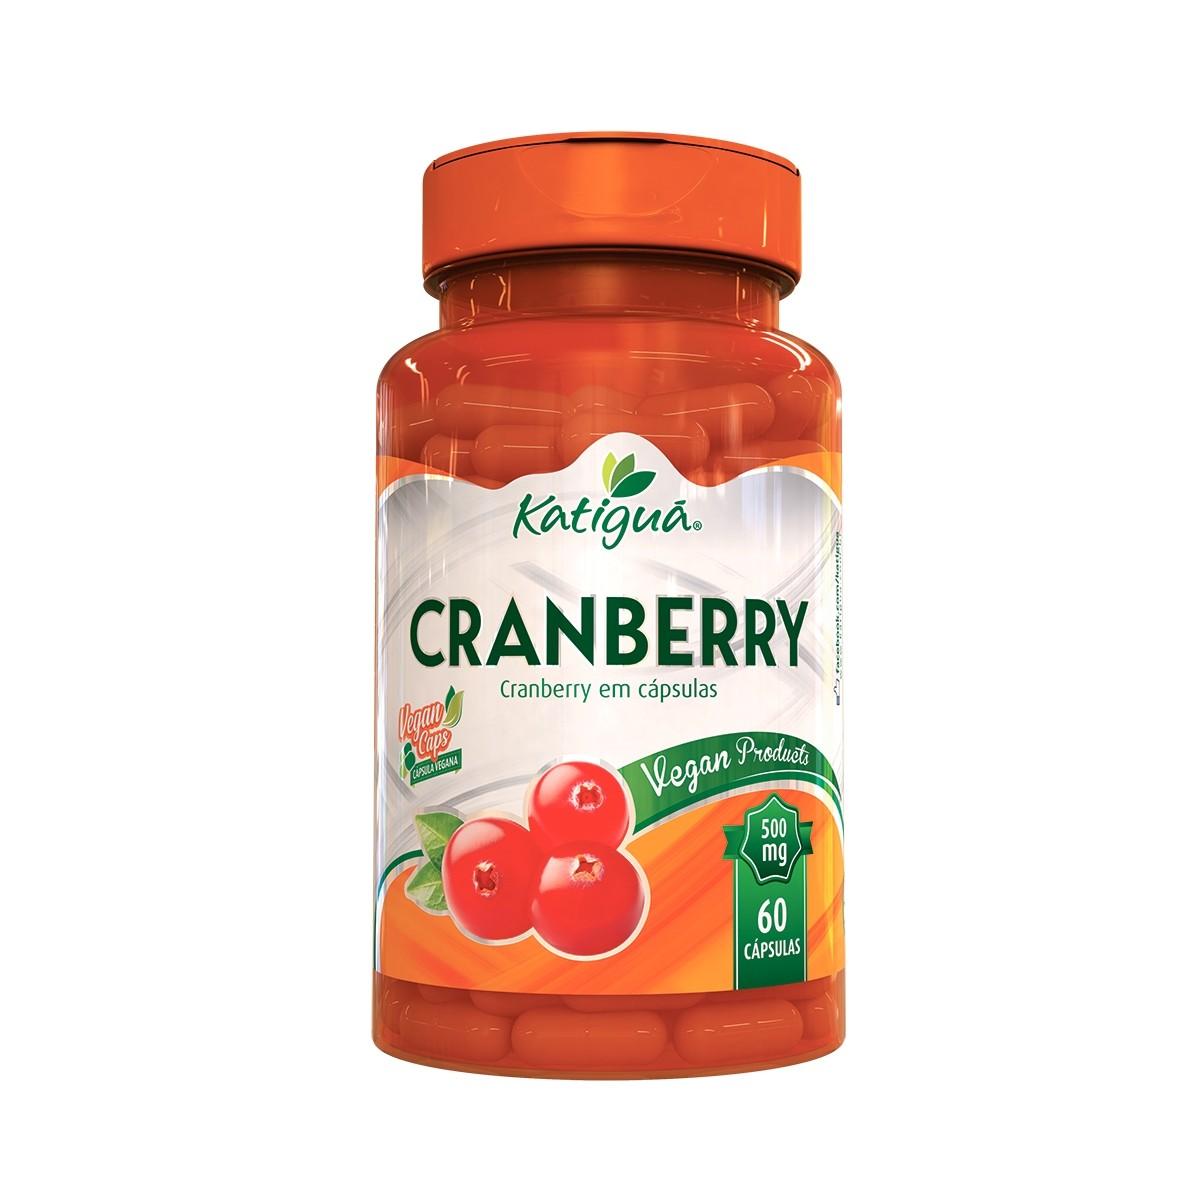 Cranberry 500mg 60 Cápsulas - Katiguá